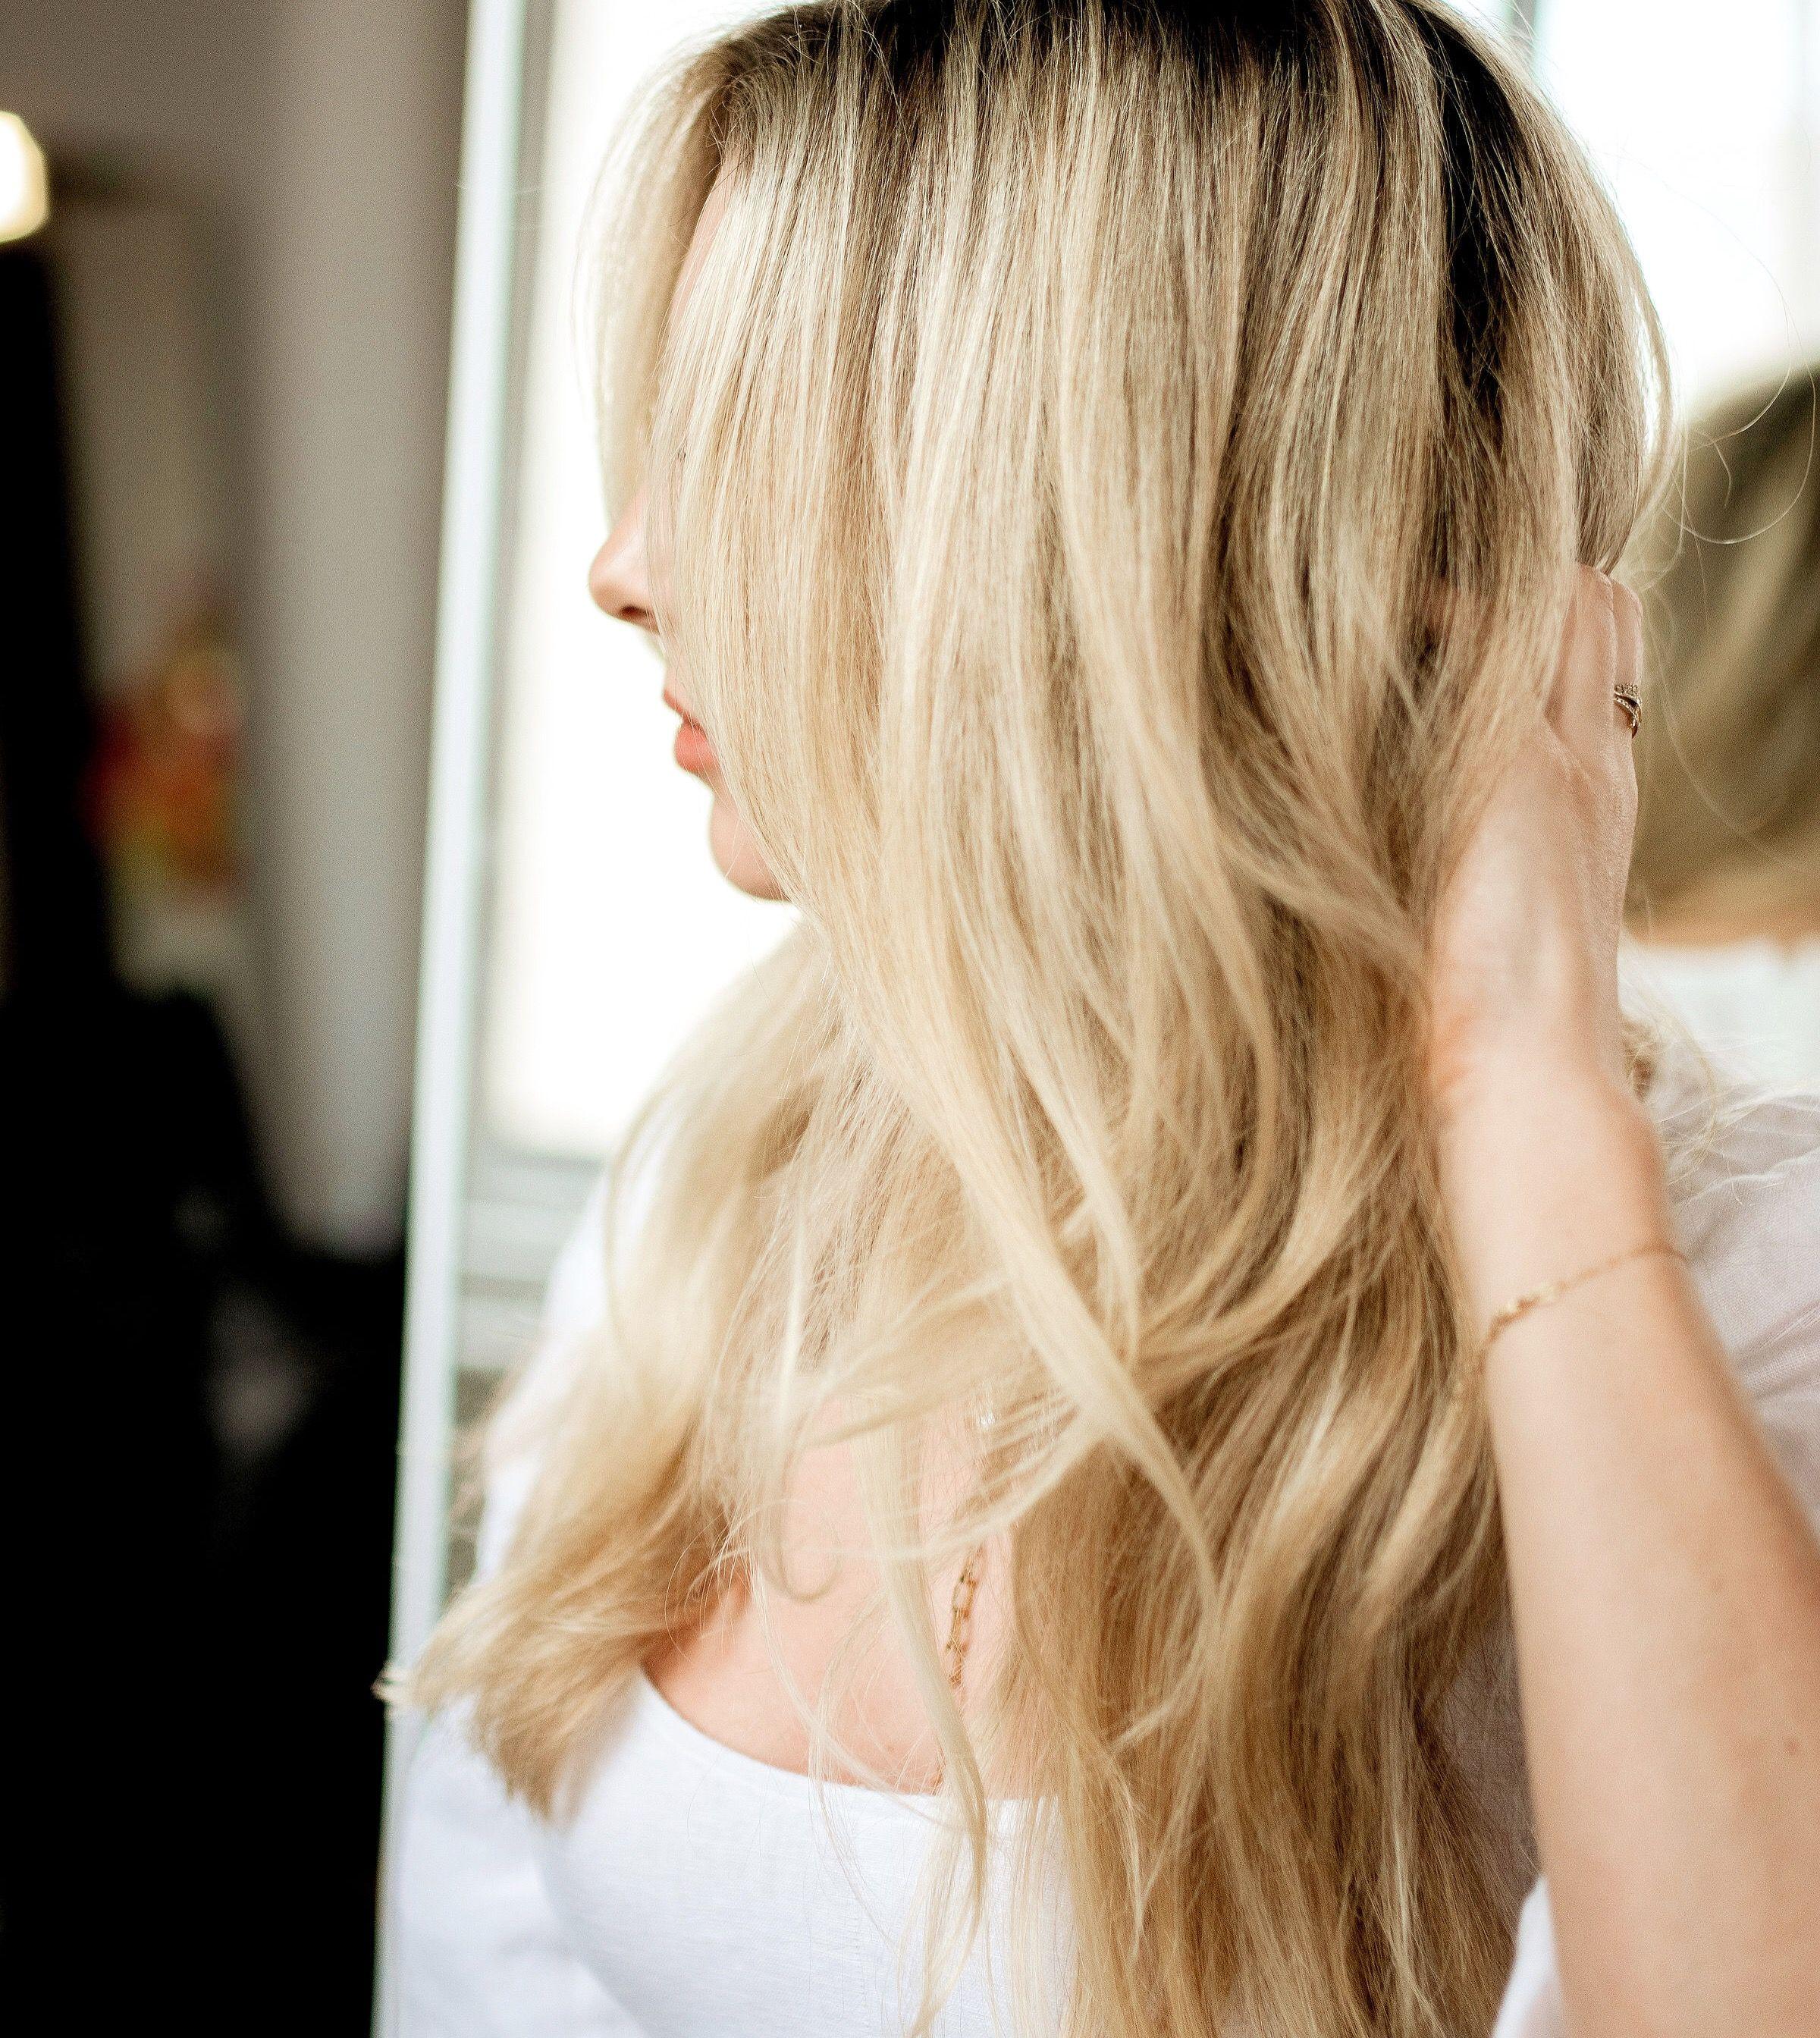 Blonde hair by LRN